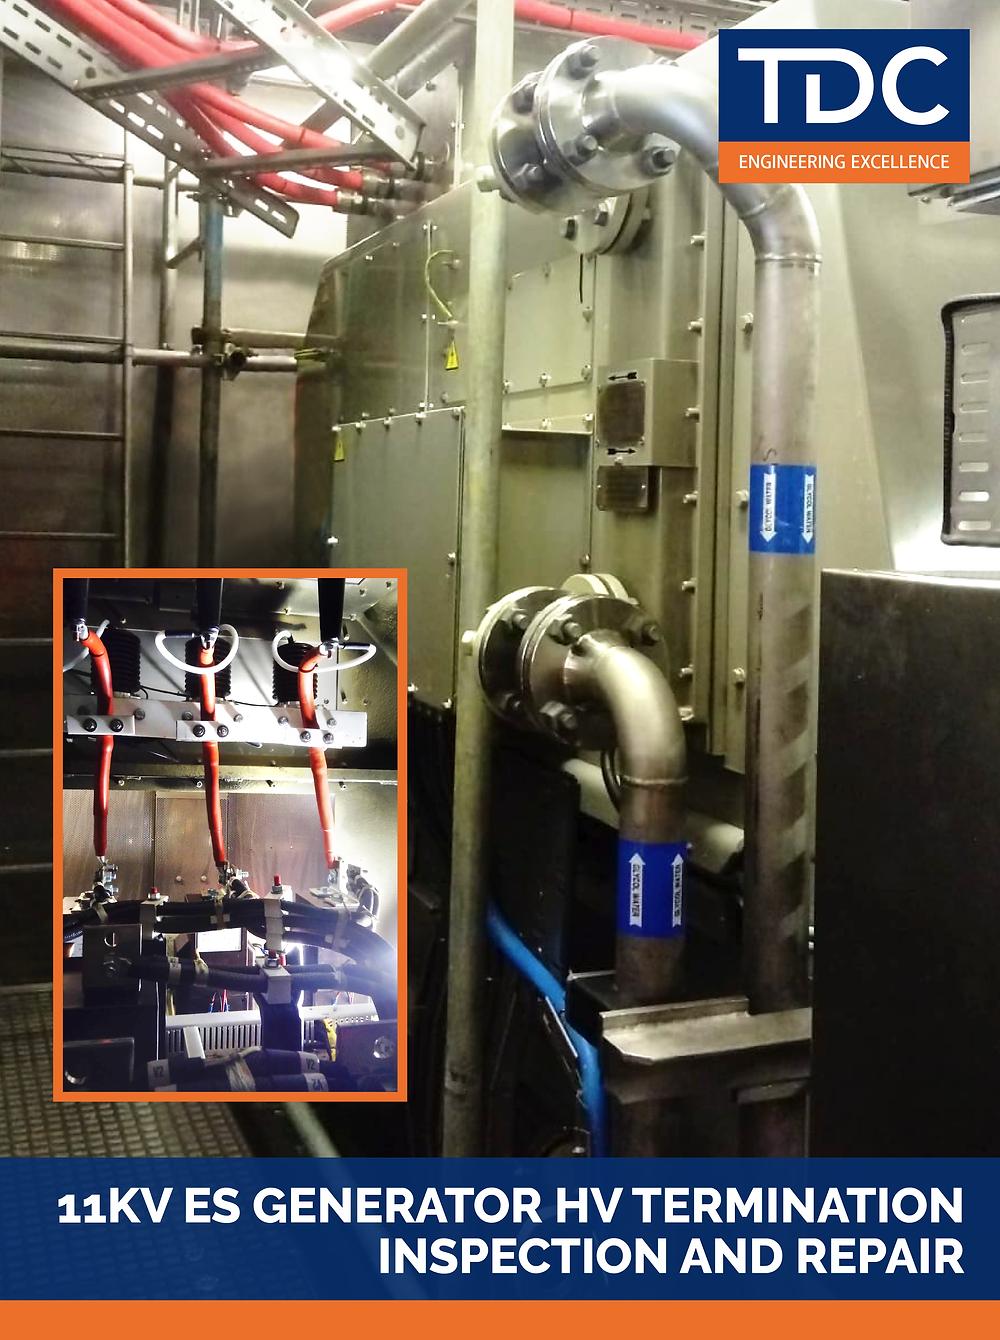 11kV ES Generator HV Termination